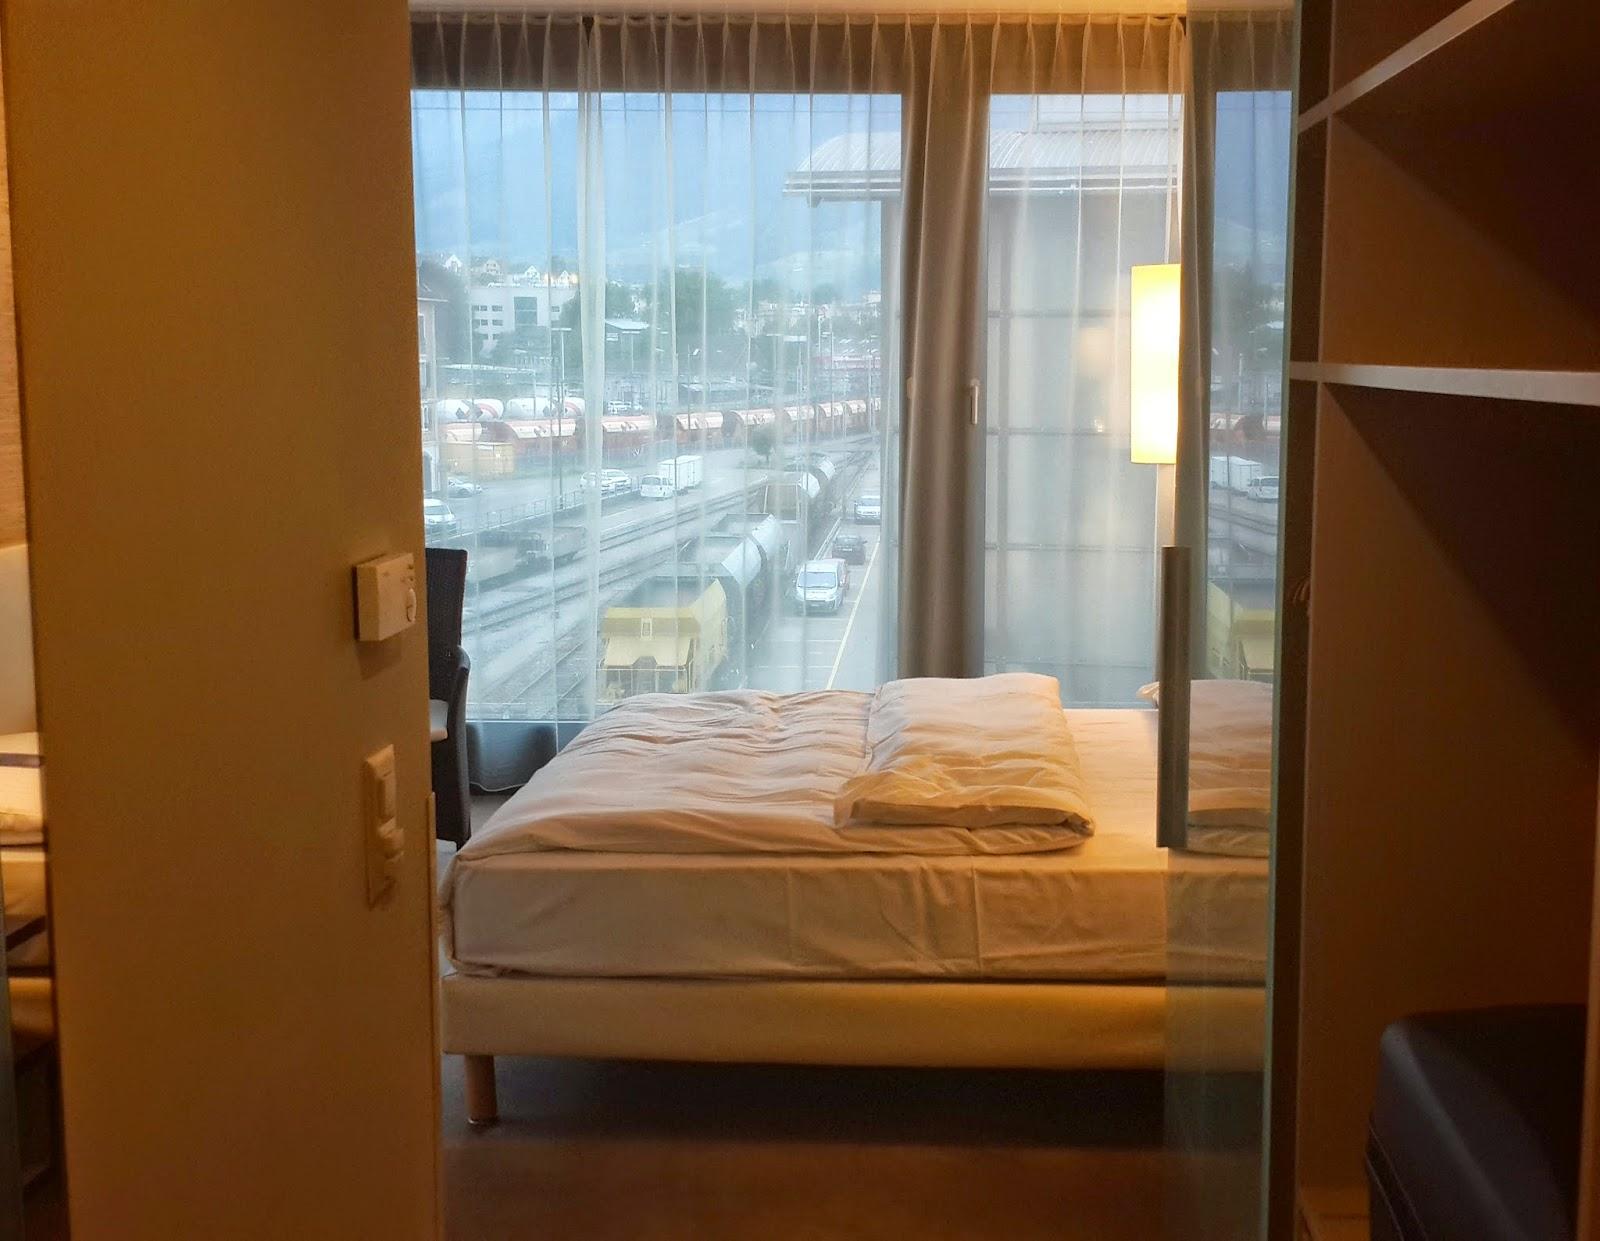 Radisson Blu Hotel Lucerne Room Photos